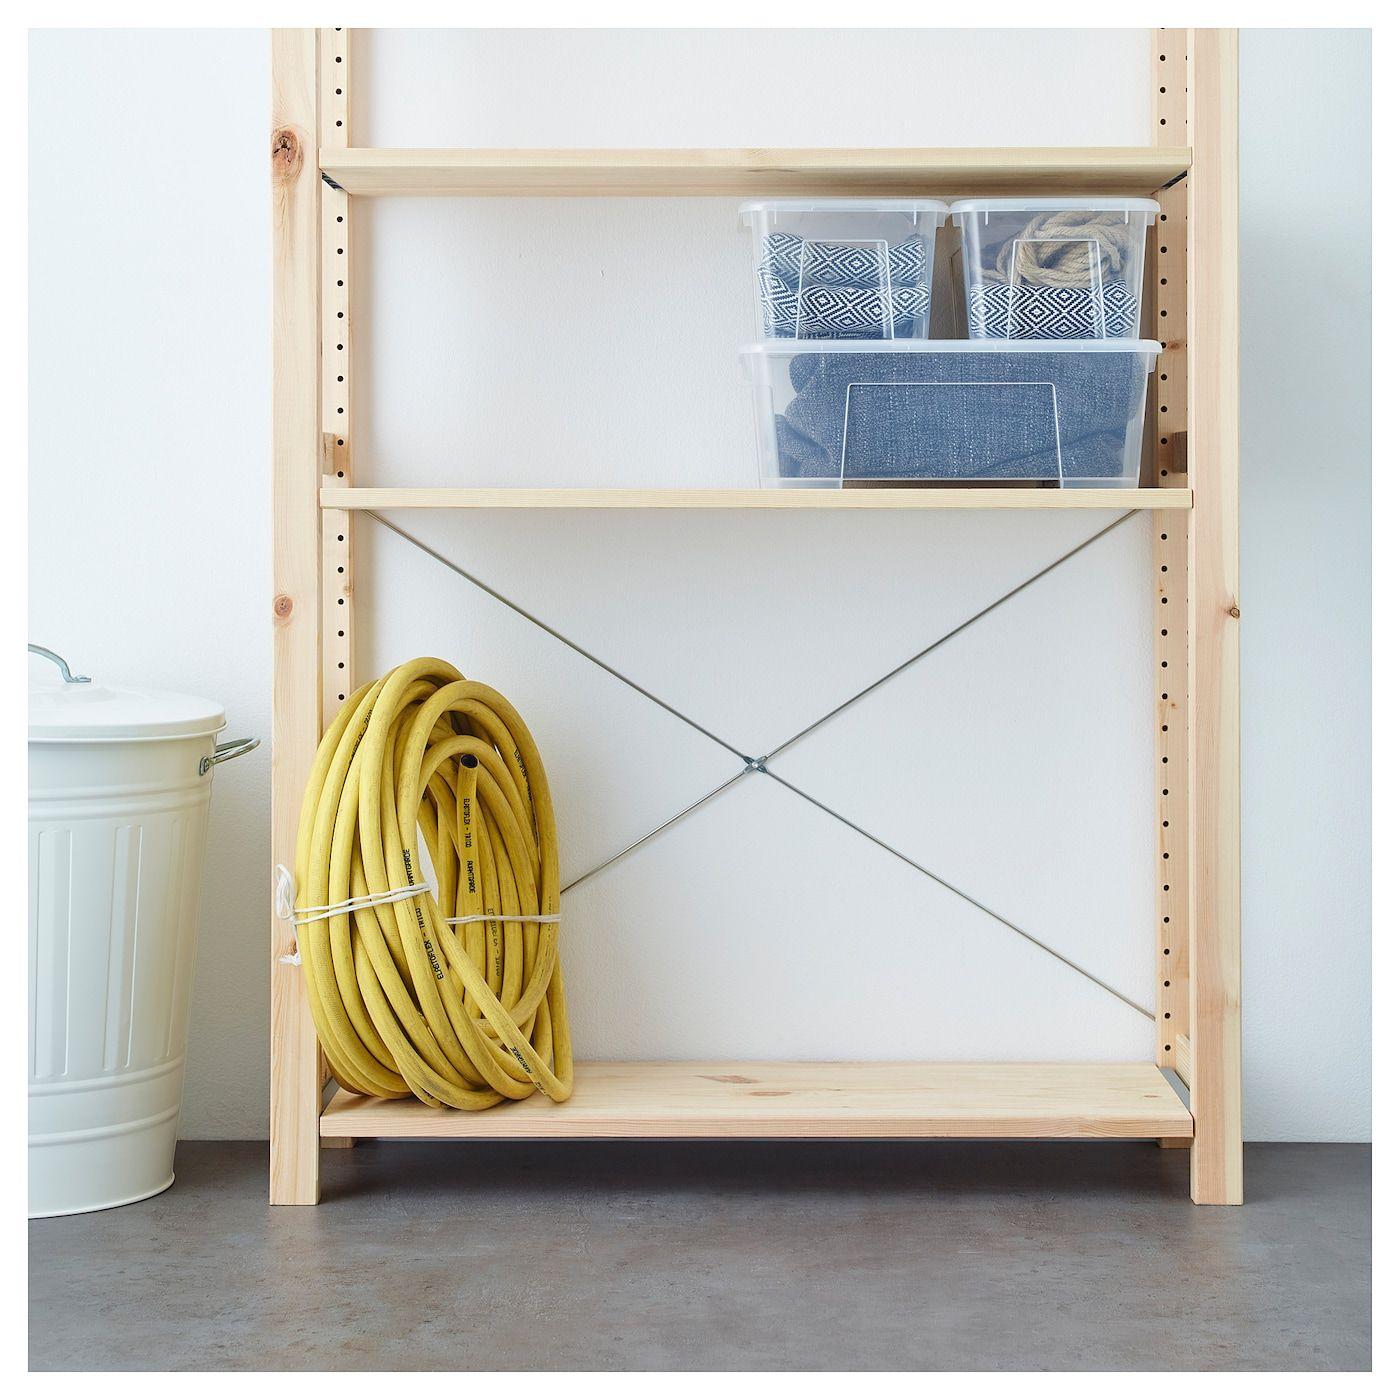 Ikea Scaffali Legno Ivar ivar scaffale - pino 89x30x179 cm (con immagini) | idee